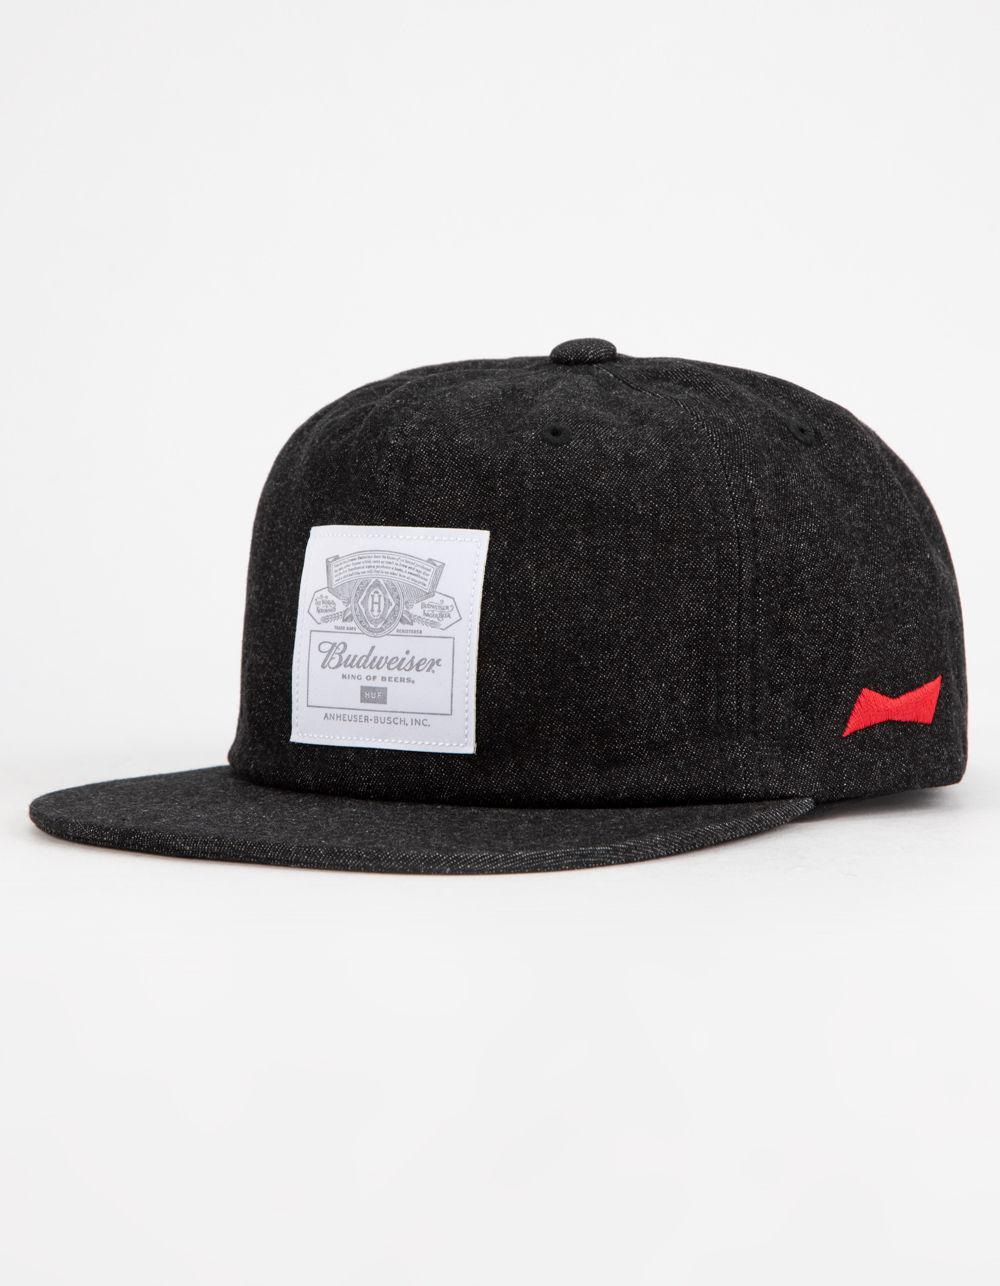 5efb6dc767483 Lyst - Huf X Budweiser 6 Panel Black Mens Strapback Hat in Black for Men